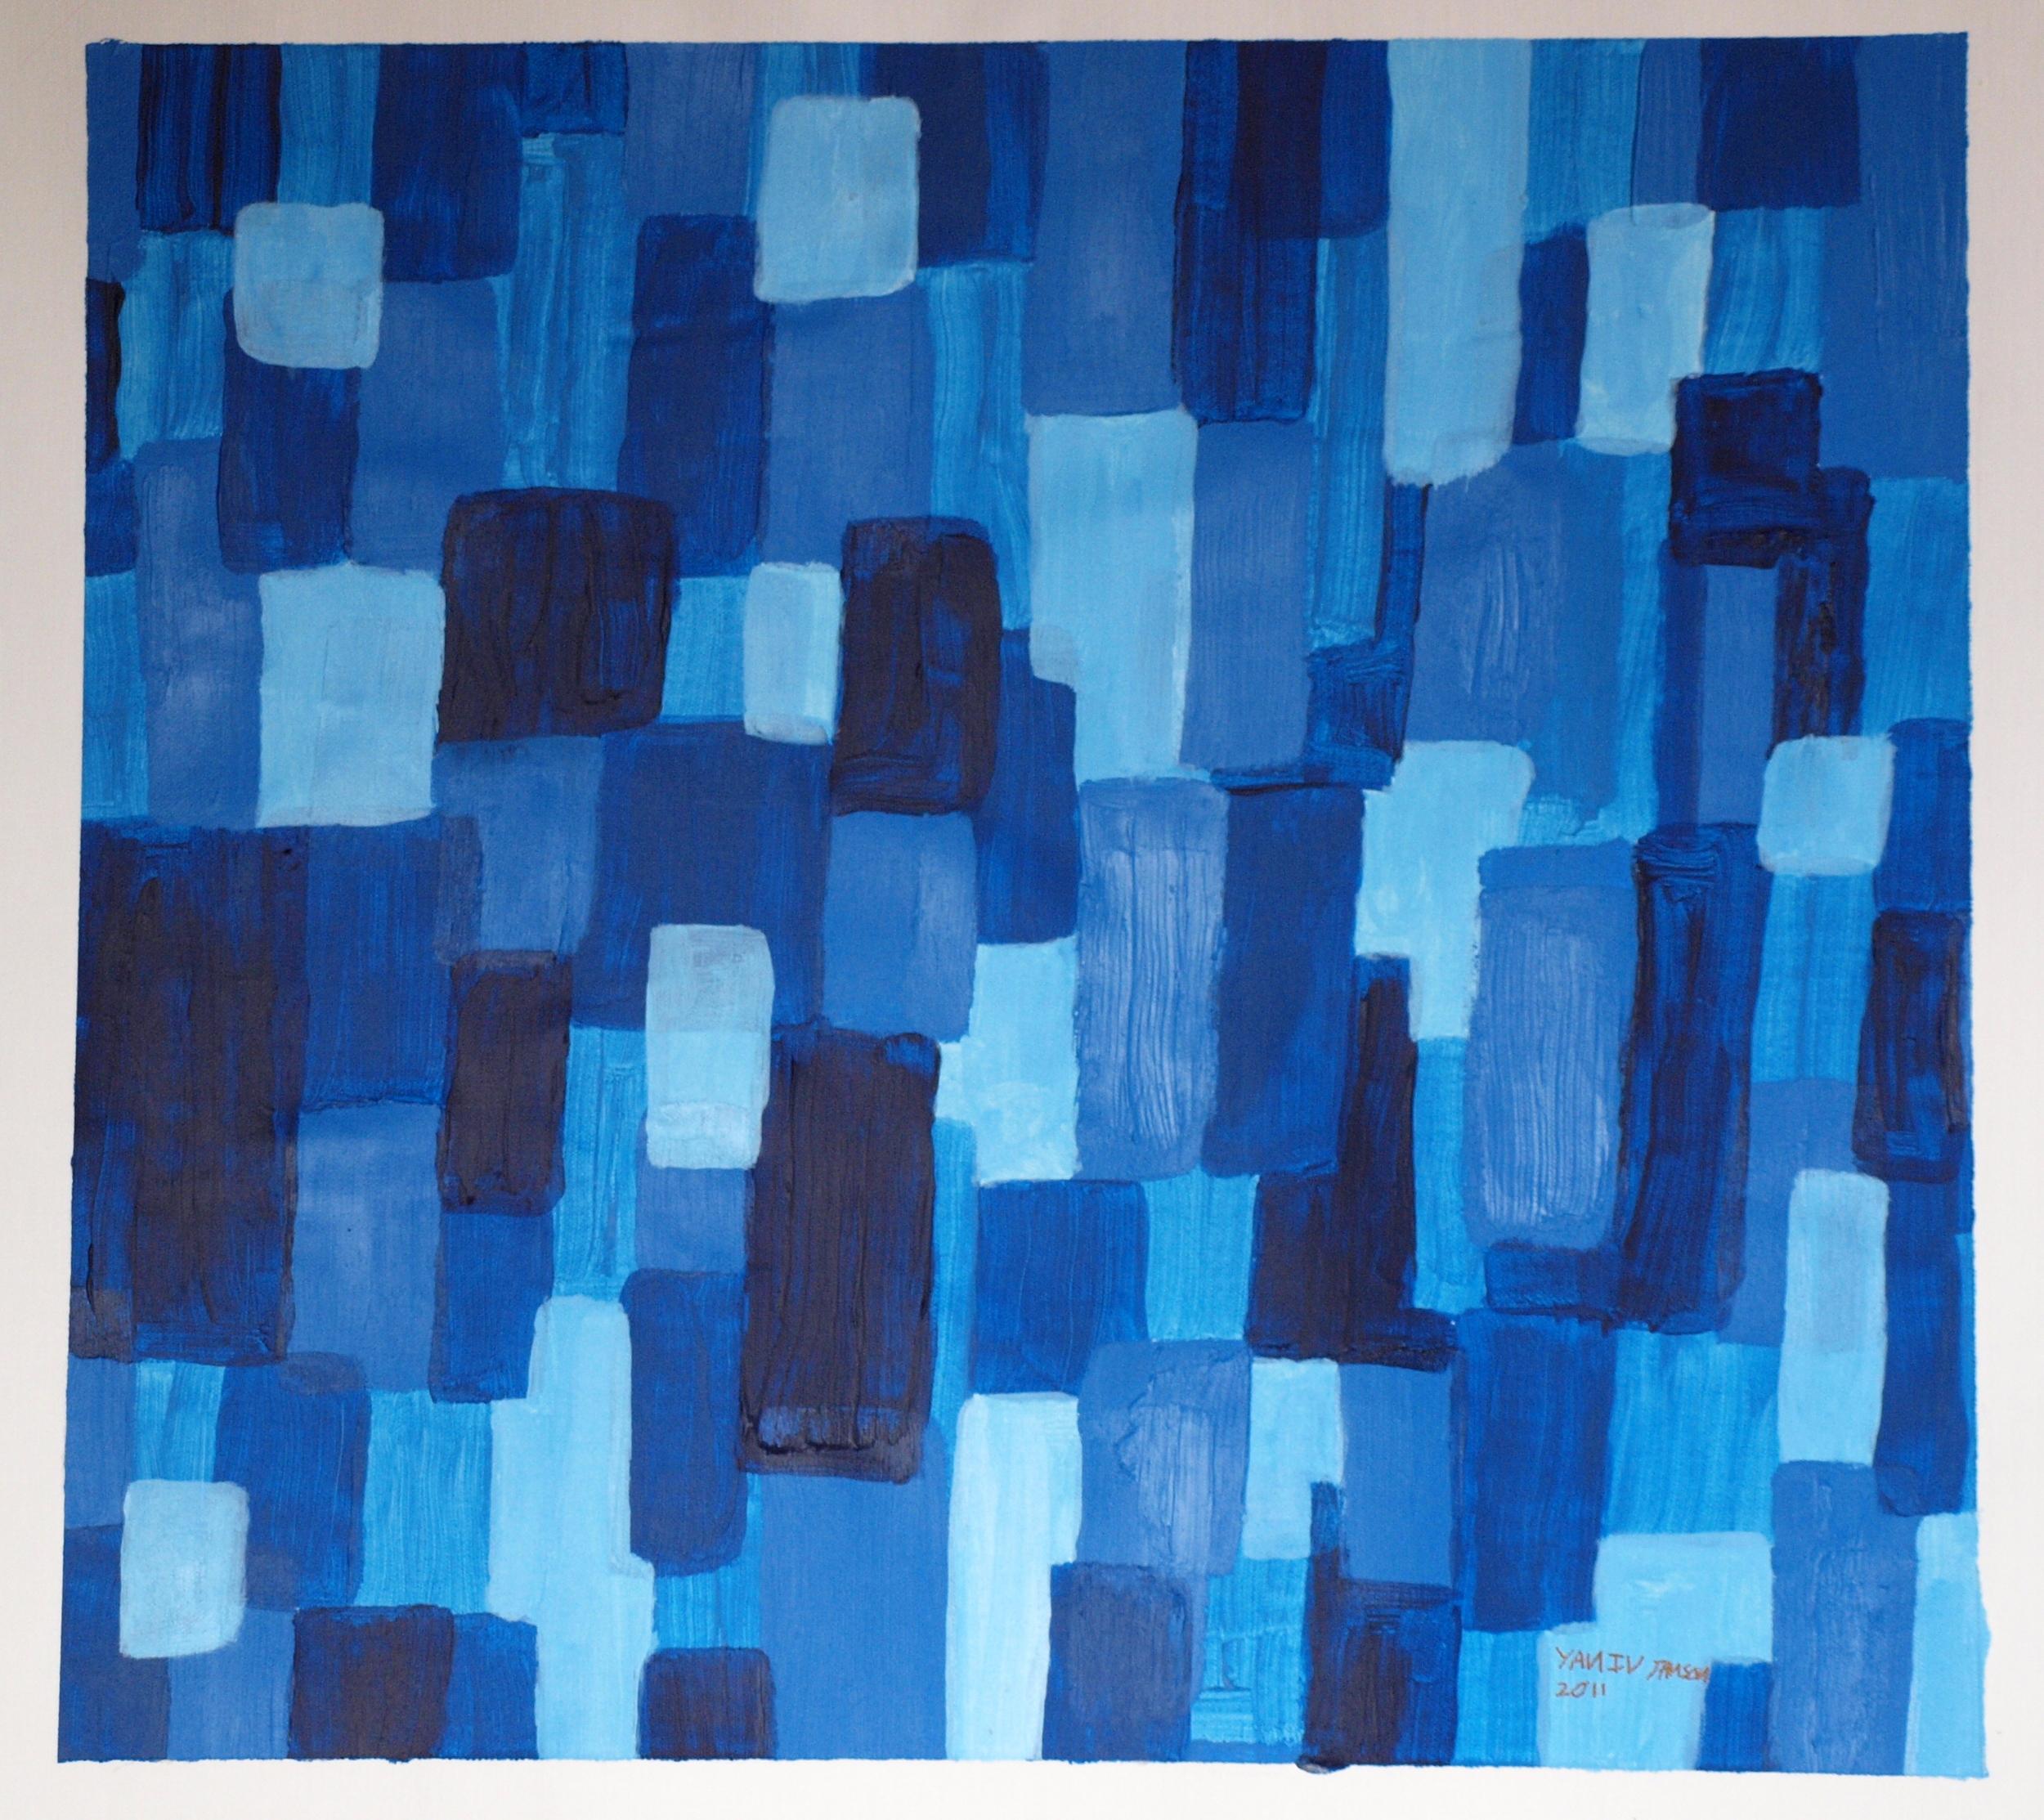 BLUES, ACRYLIC ON CANVAS, 56 X 61CM